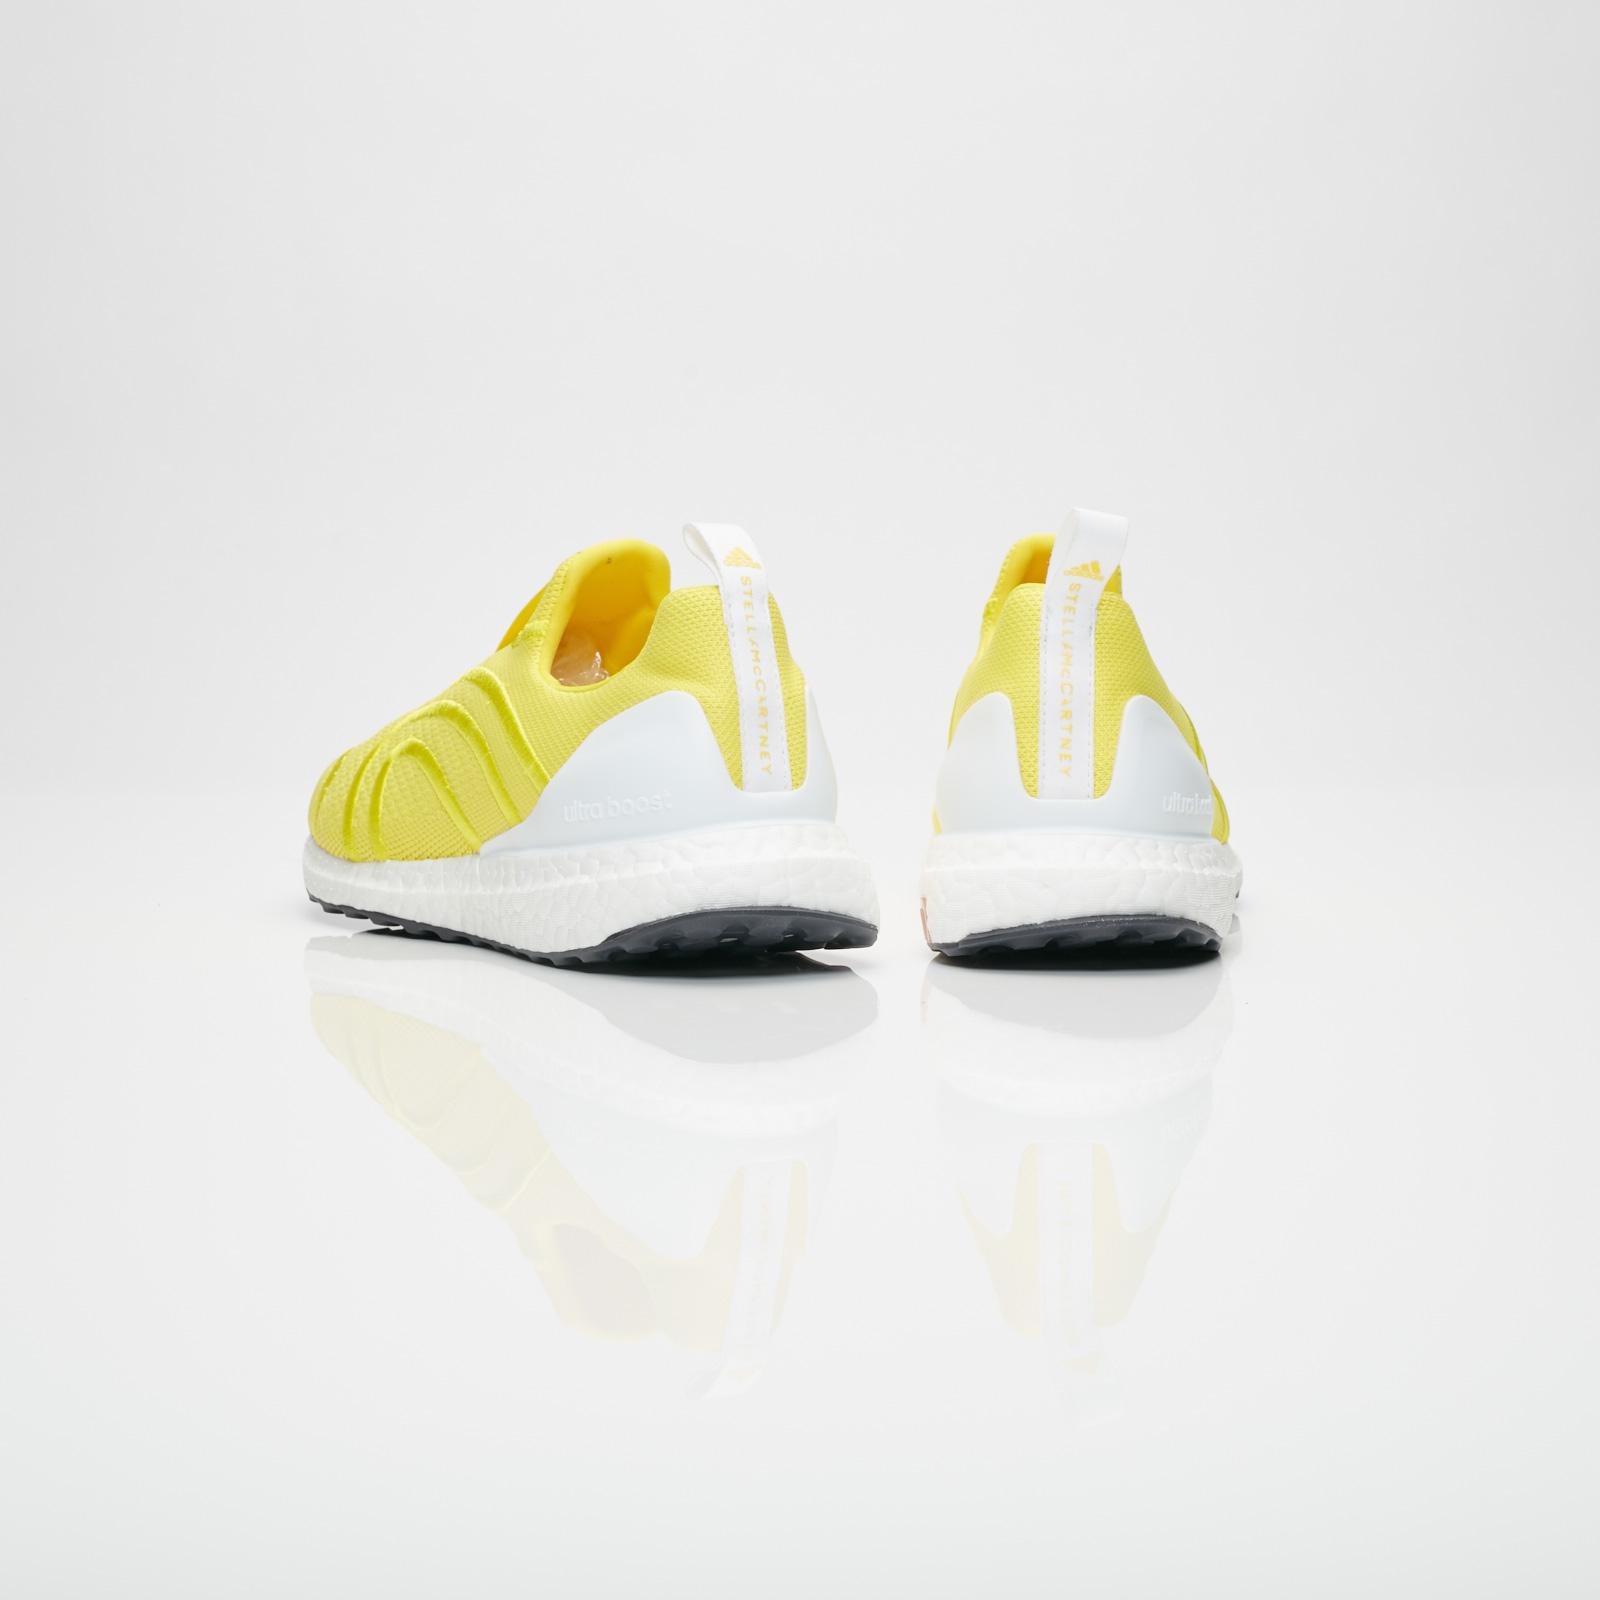 7e19aaa5de7b6 adidas UltraBOOST Uncaged - Bb6272 - Sneakersnstuff